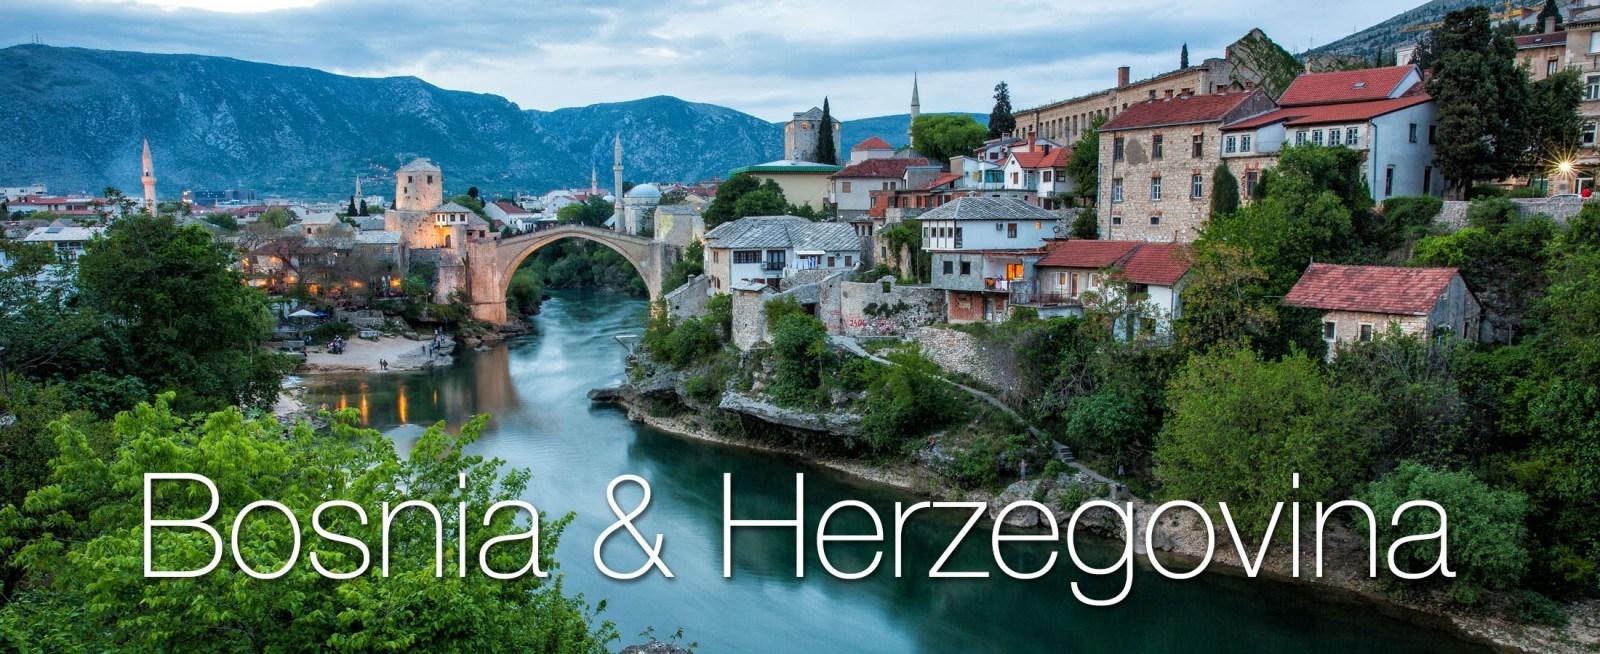 Destination Bosnia Herzegovina